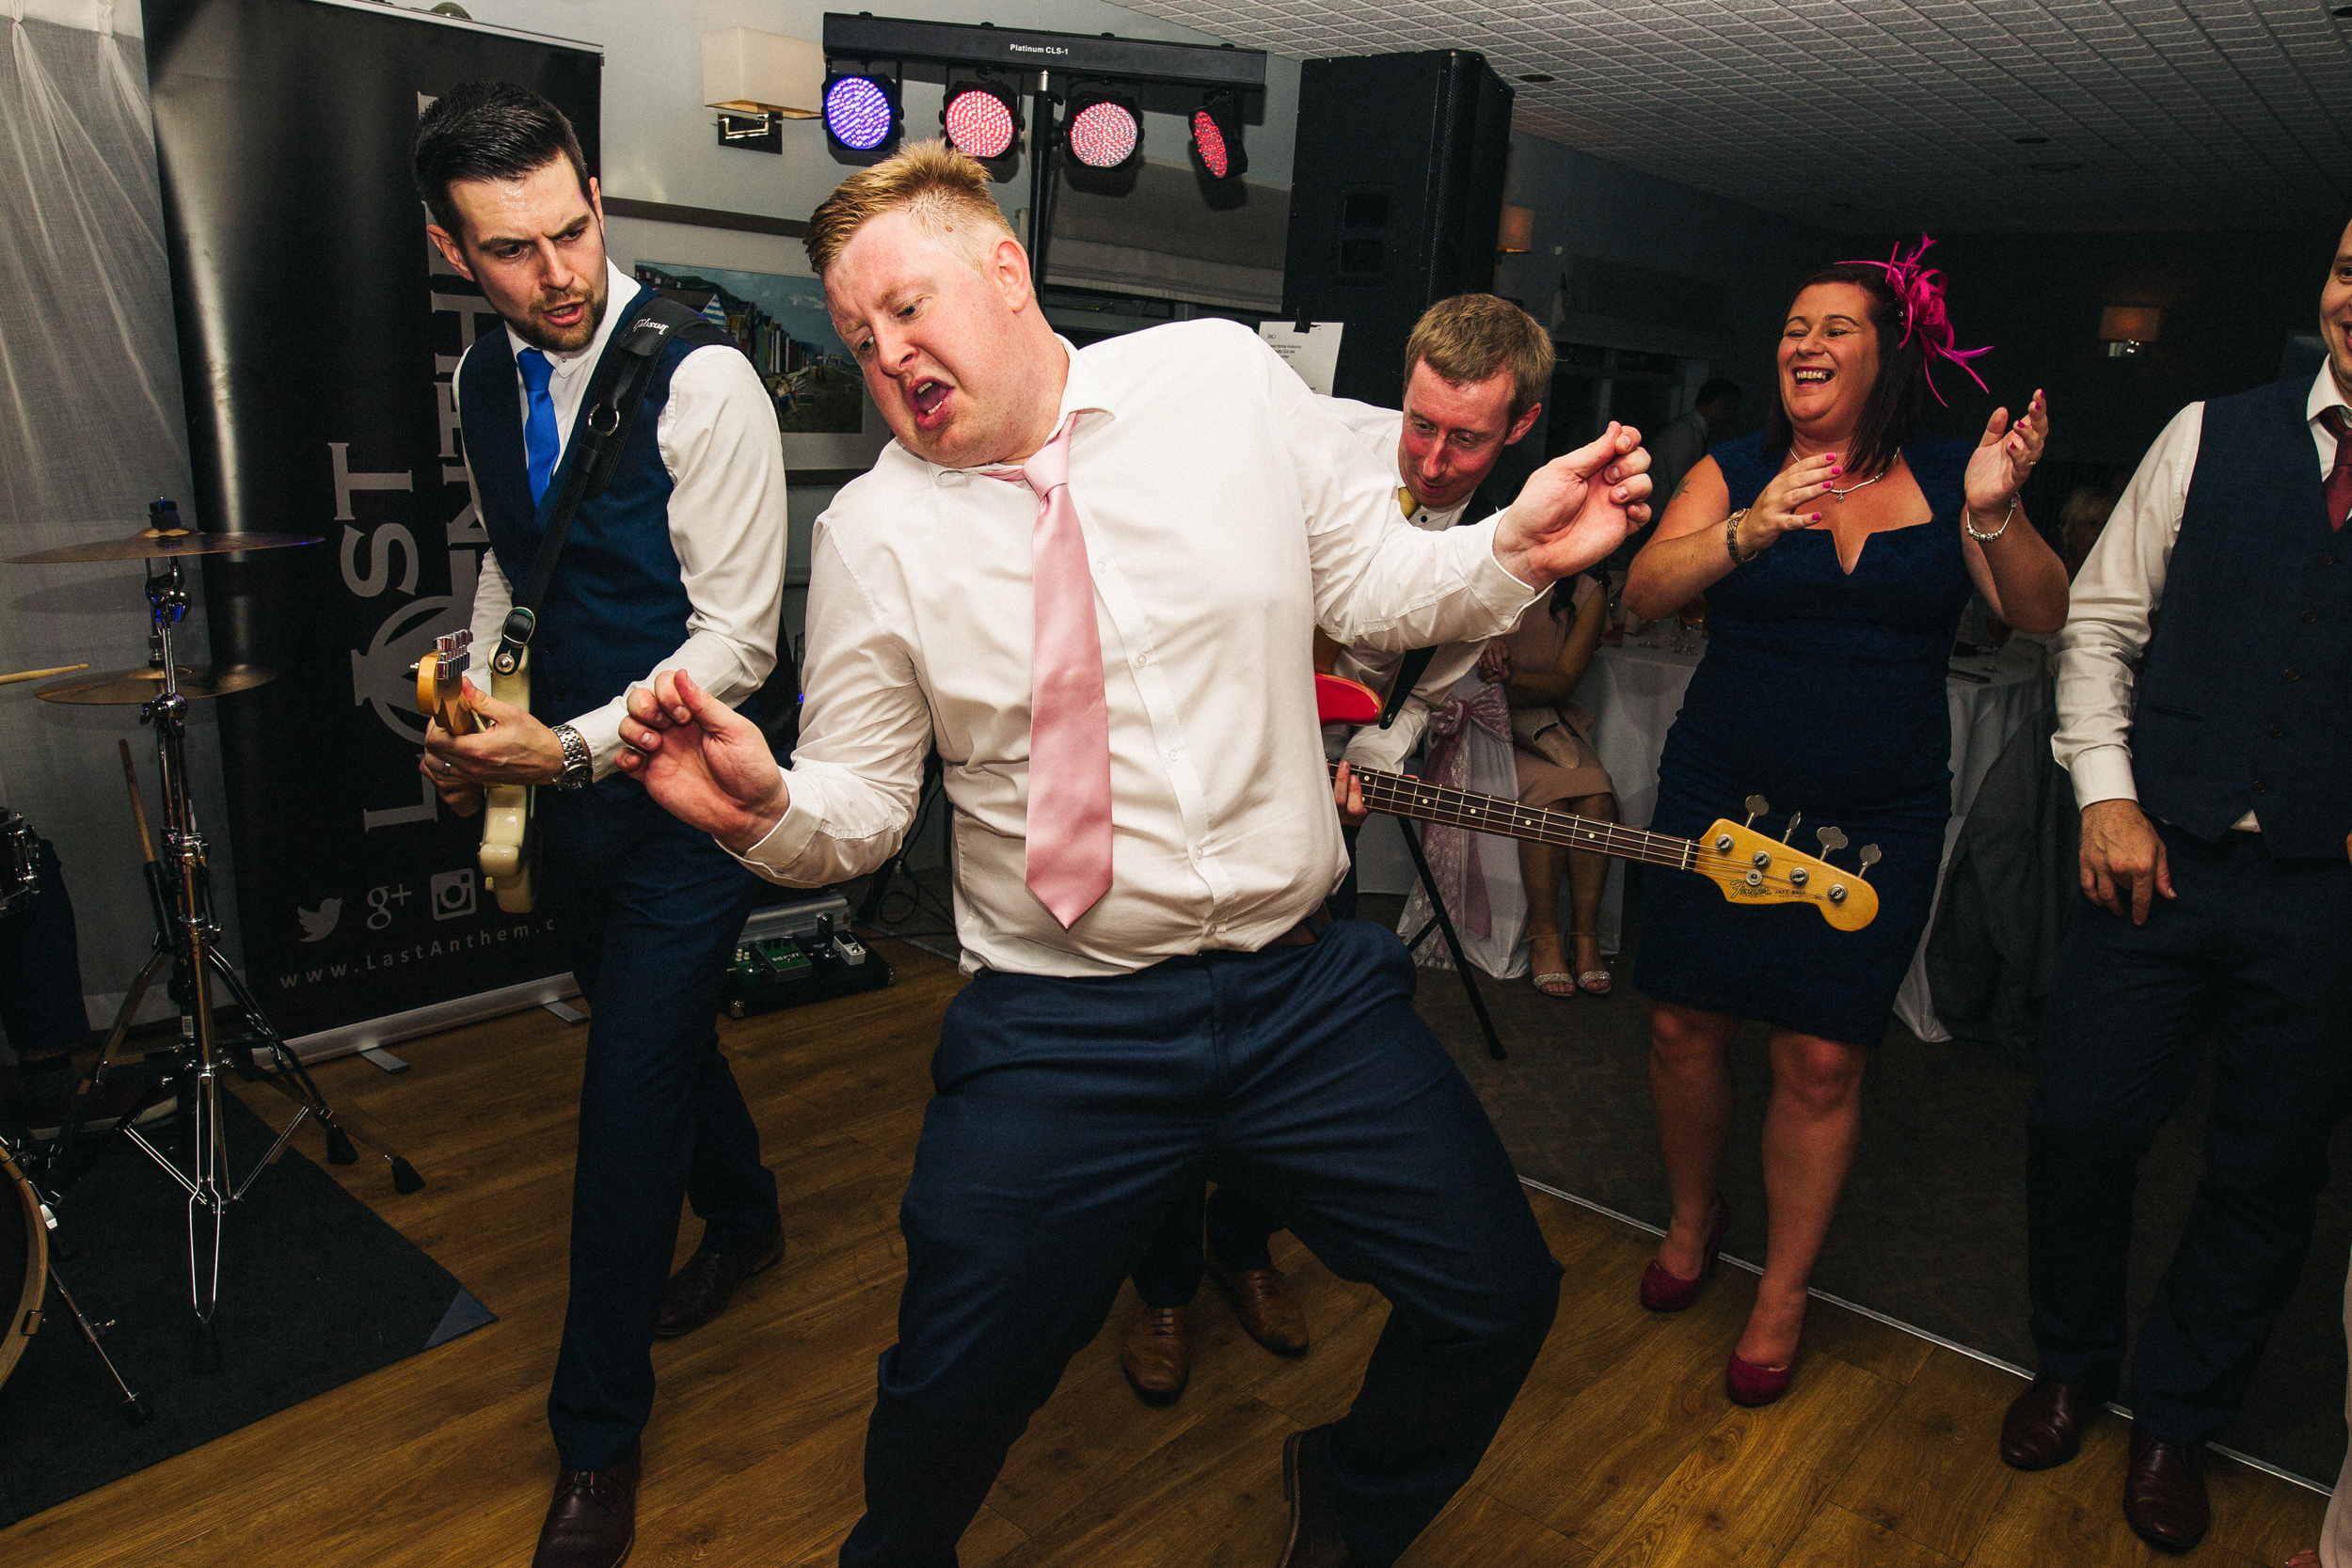 creative-wedding-photography-teesside-north-east-yorkshire-130.jpg